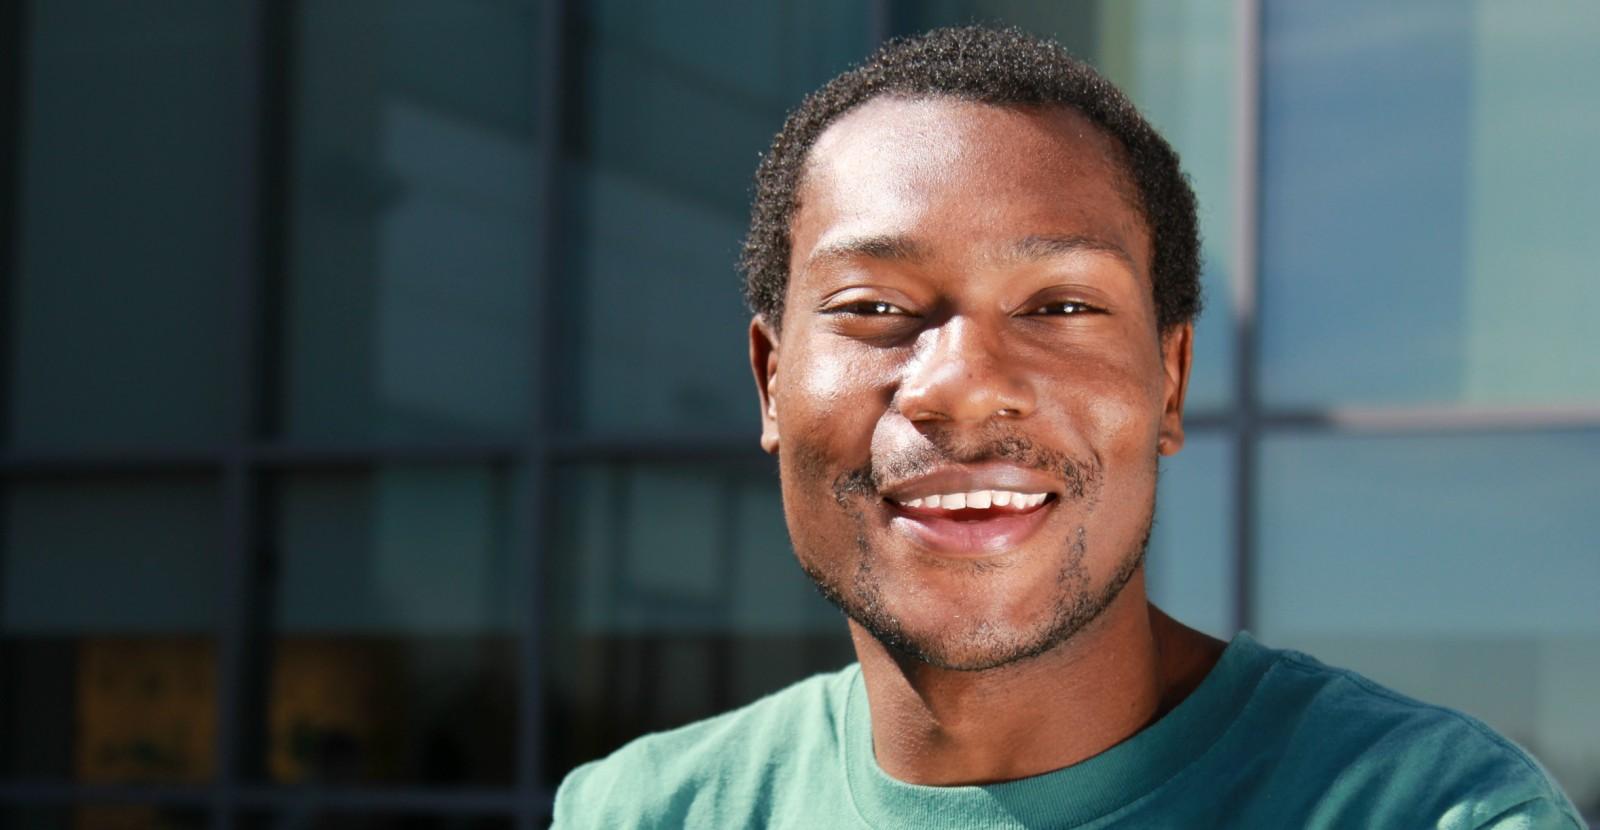 CWI Student David Mpoyi, Biology-Healthcare